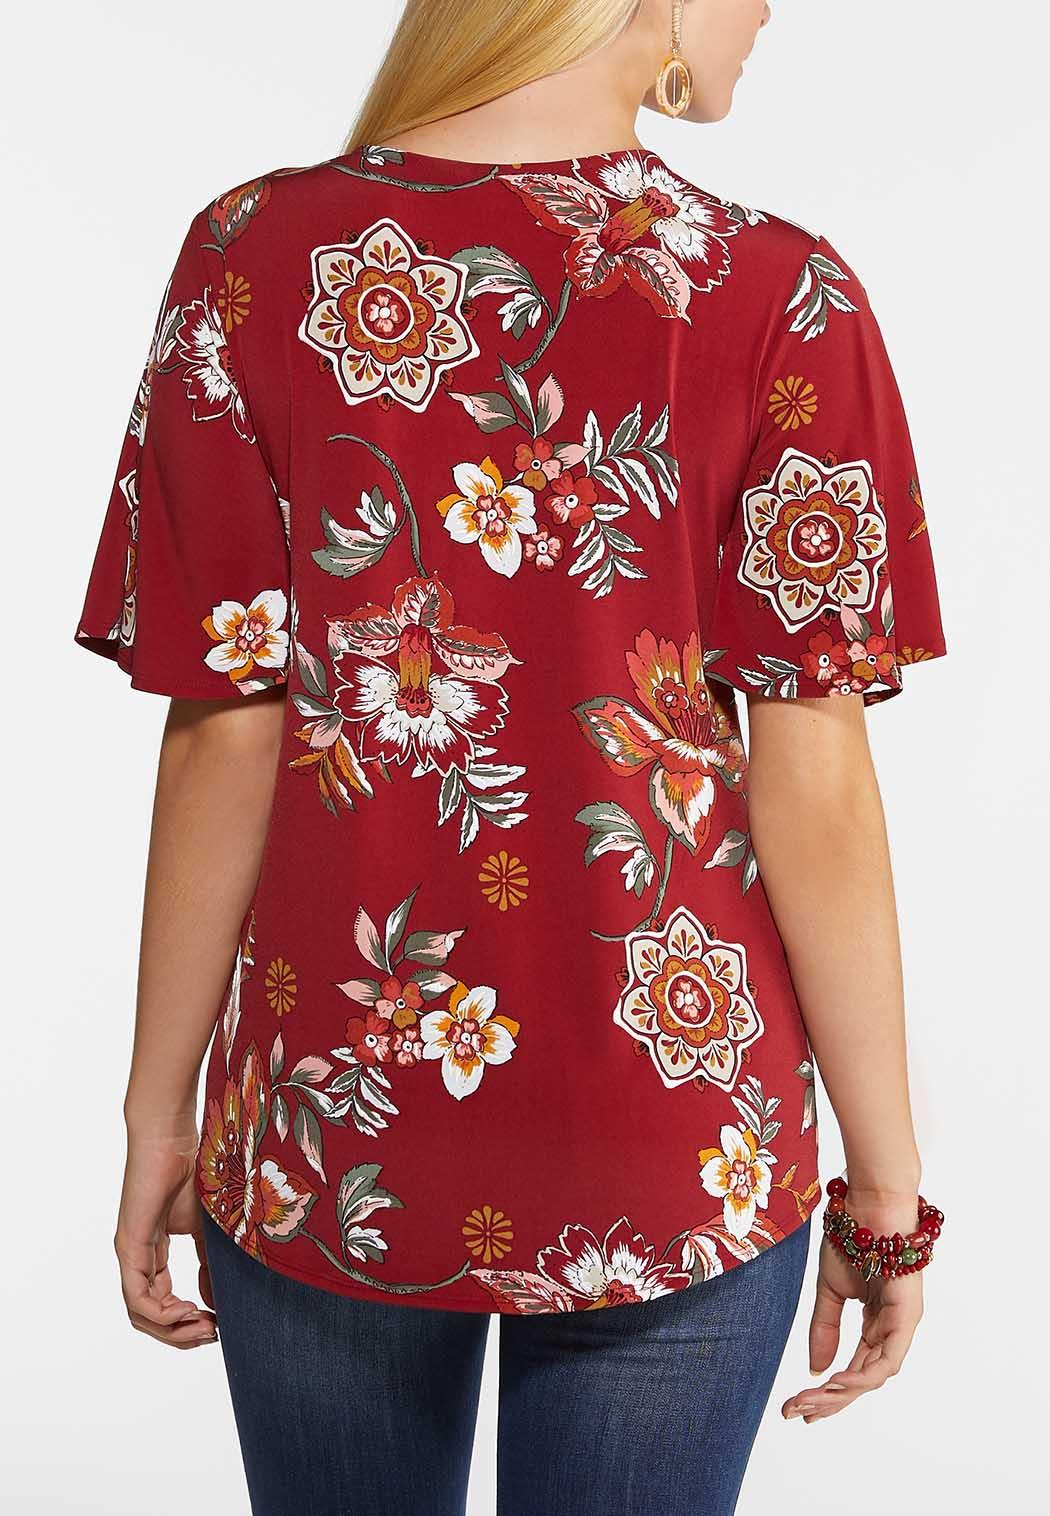 Floral Hardware Sleeve Top (Item #43964372)